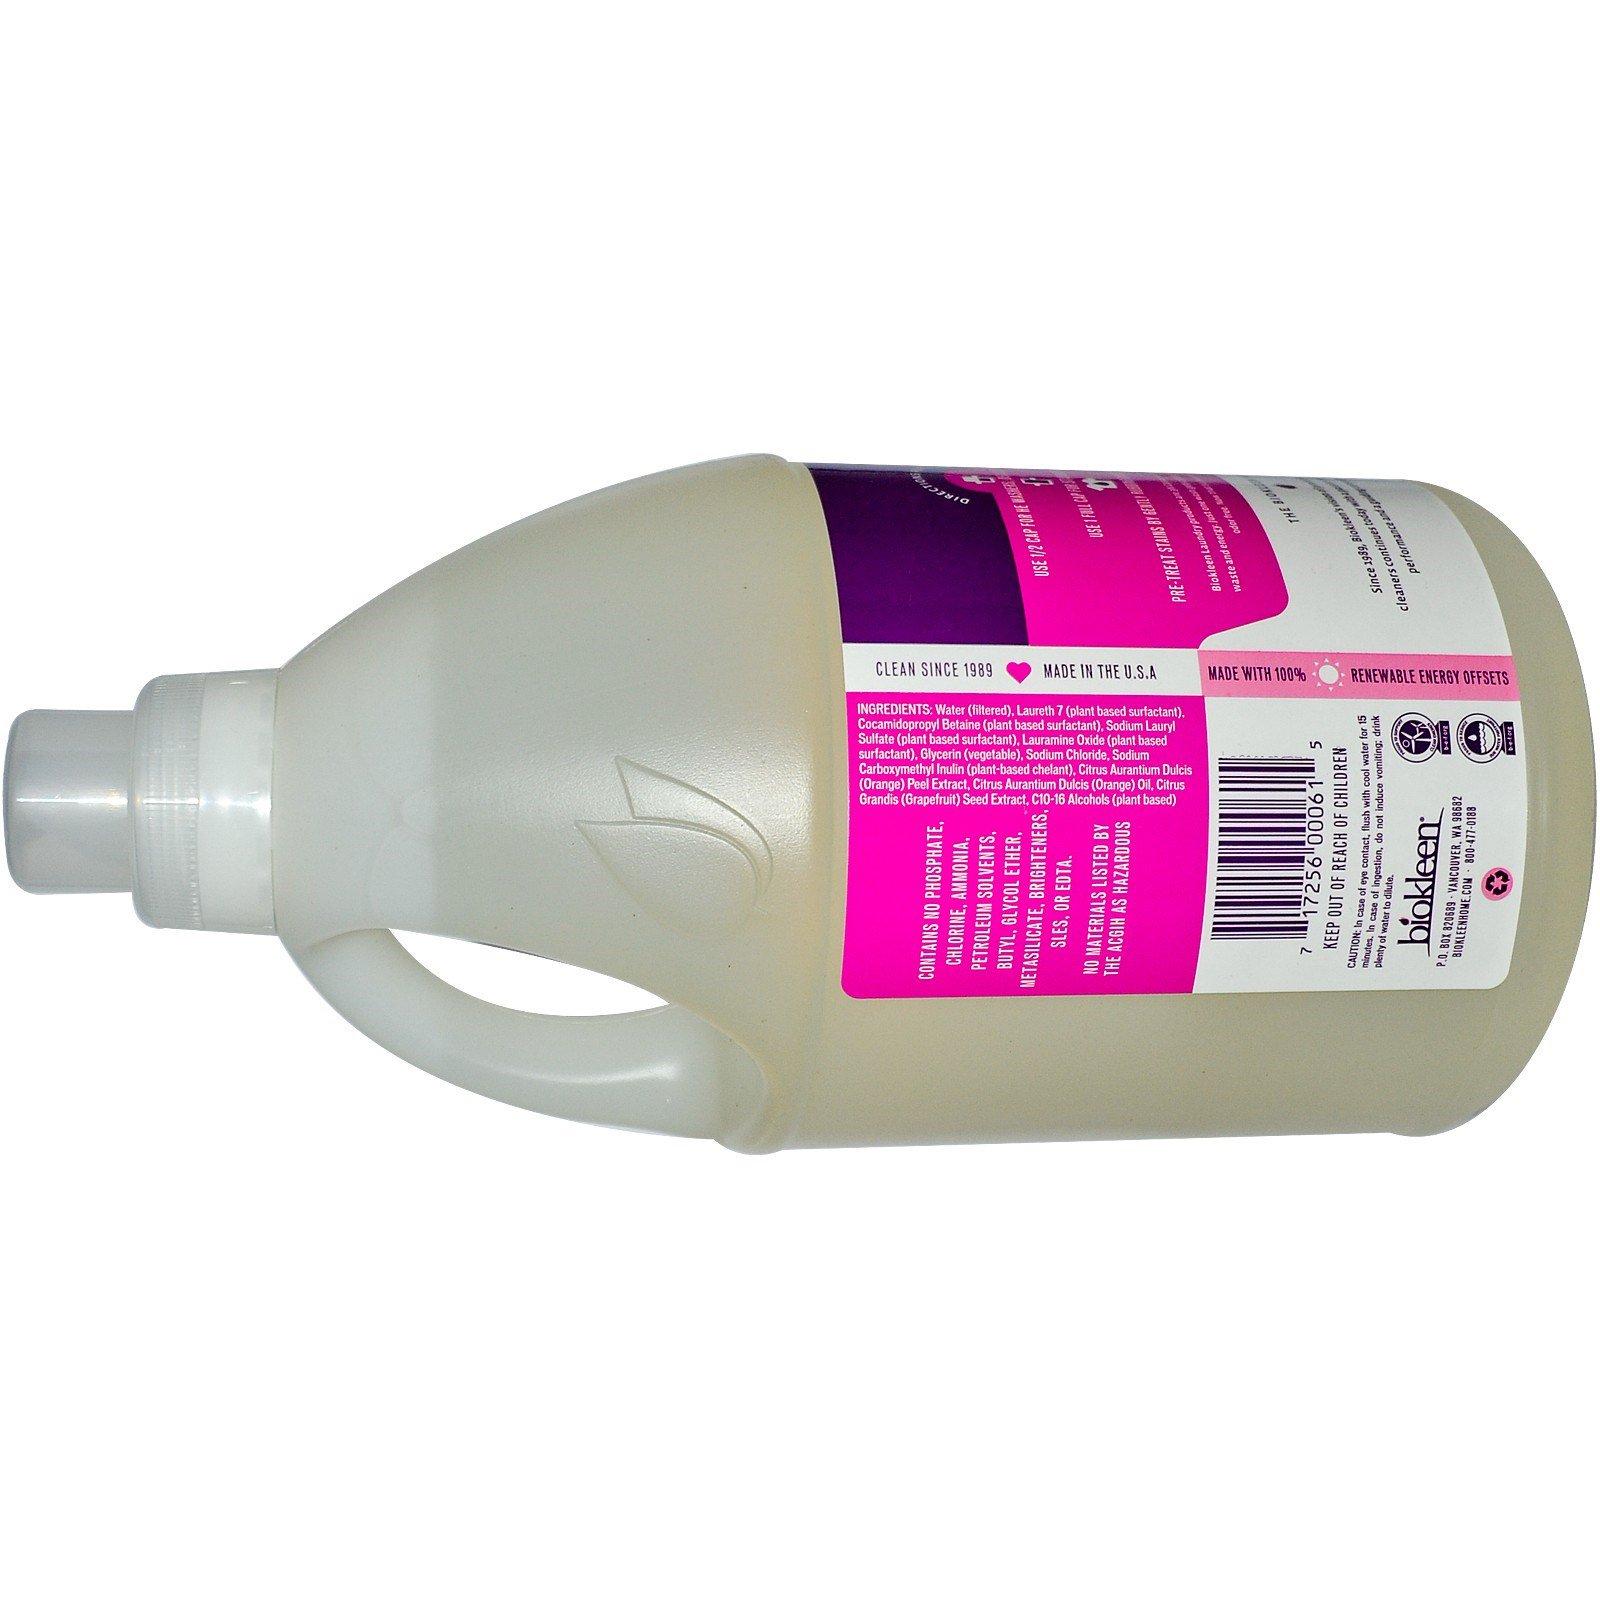 sodium chloride and orange oil Retail product ingredients sinensis var sanguina (blood orange) oil, citrus grandis (pink gluconic acid, aqua (water), glycerin, sodium chloride.